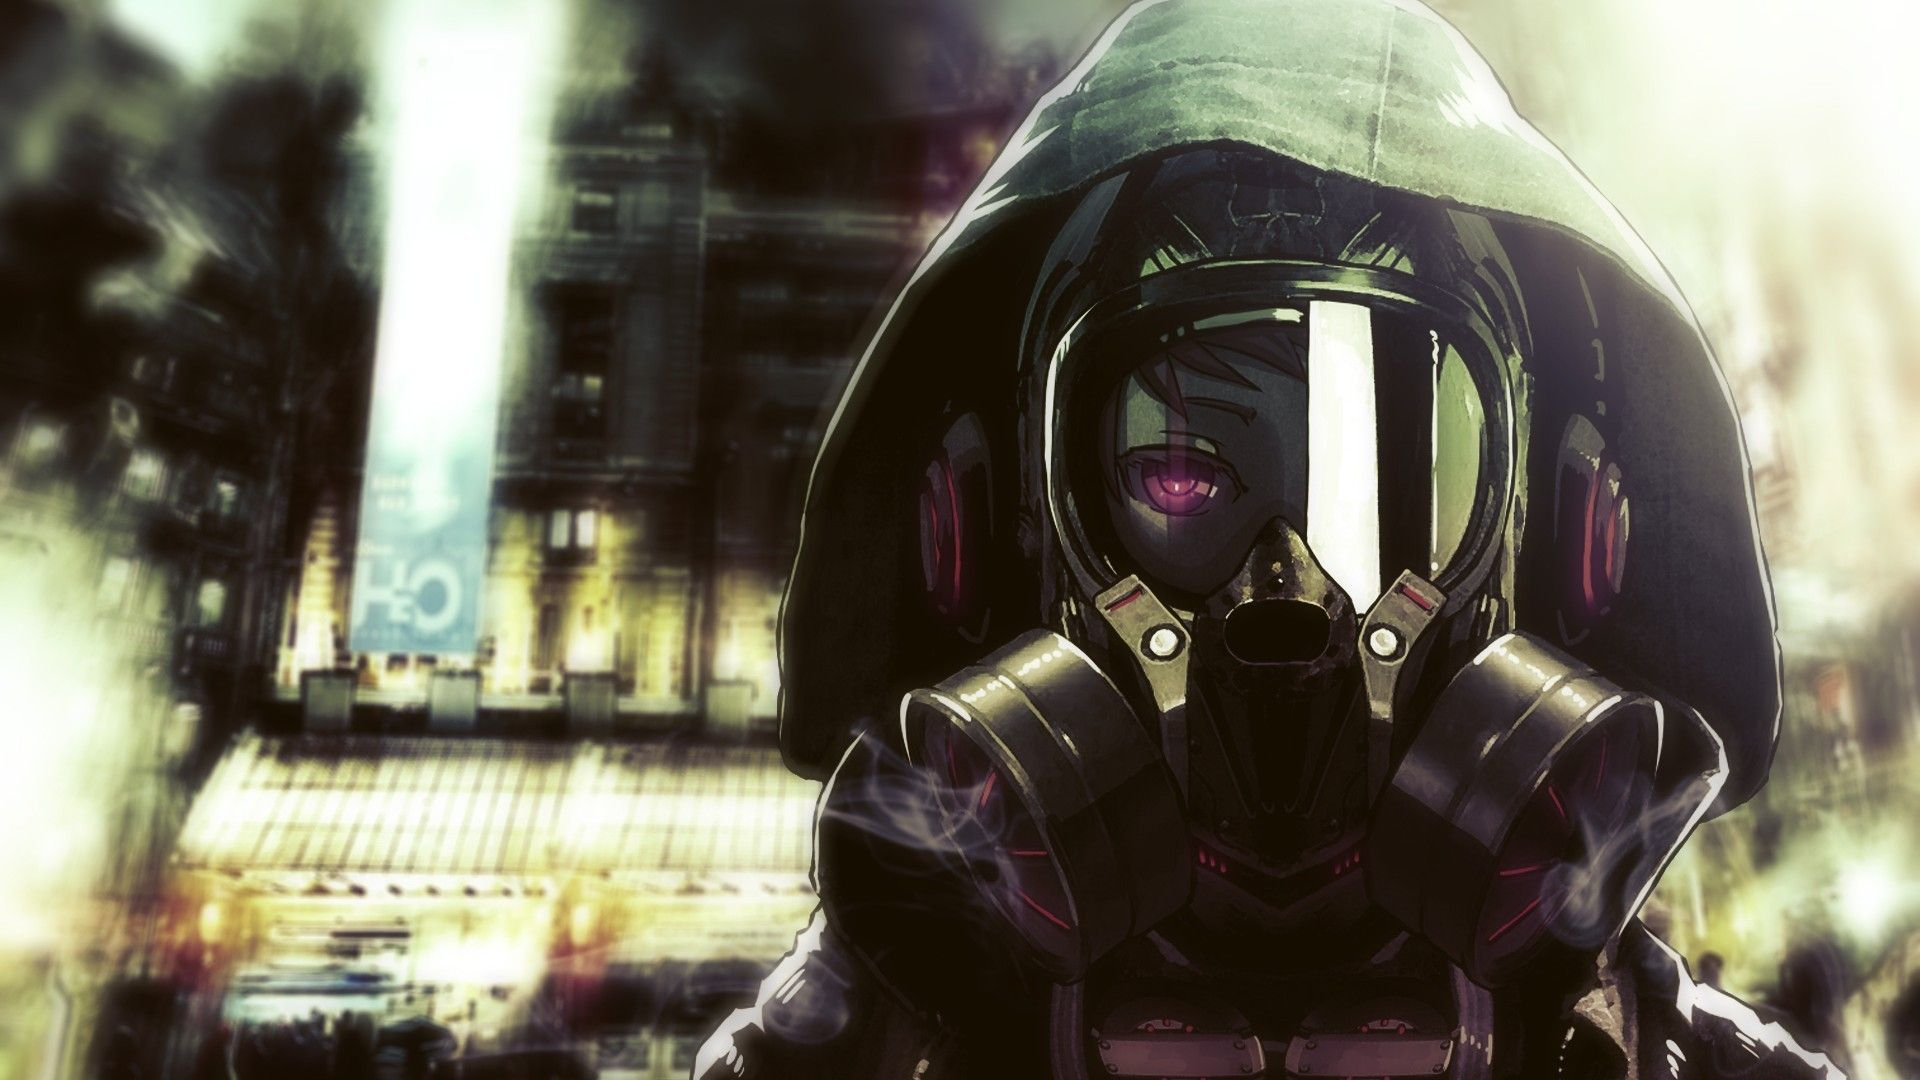 Anime Sci Fi Anime Gas Mask Wallpaper | Keiitsuo Nightcore ...